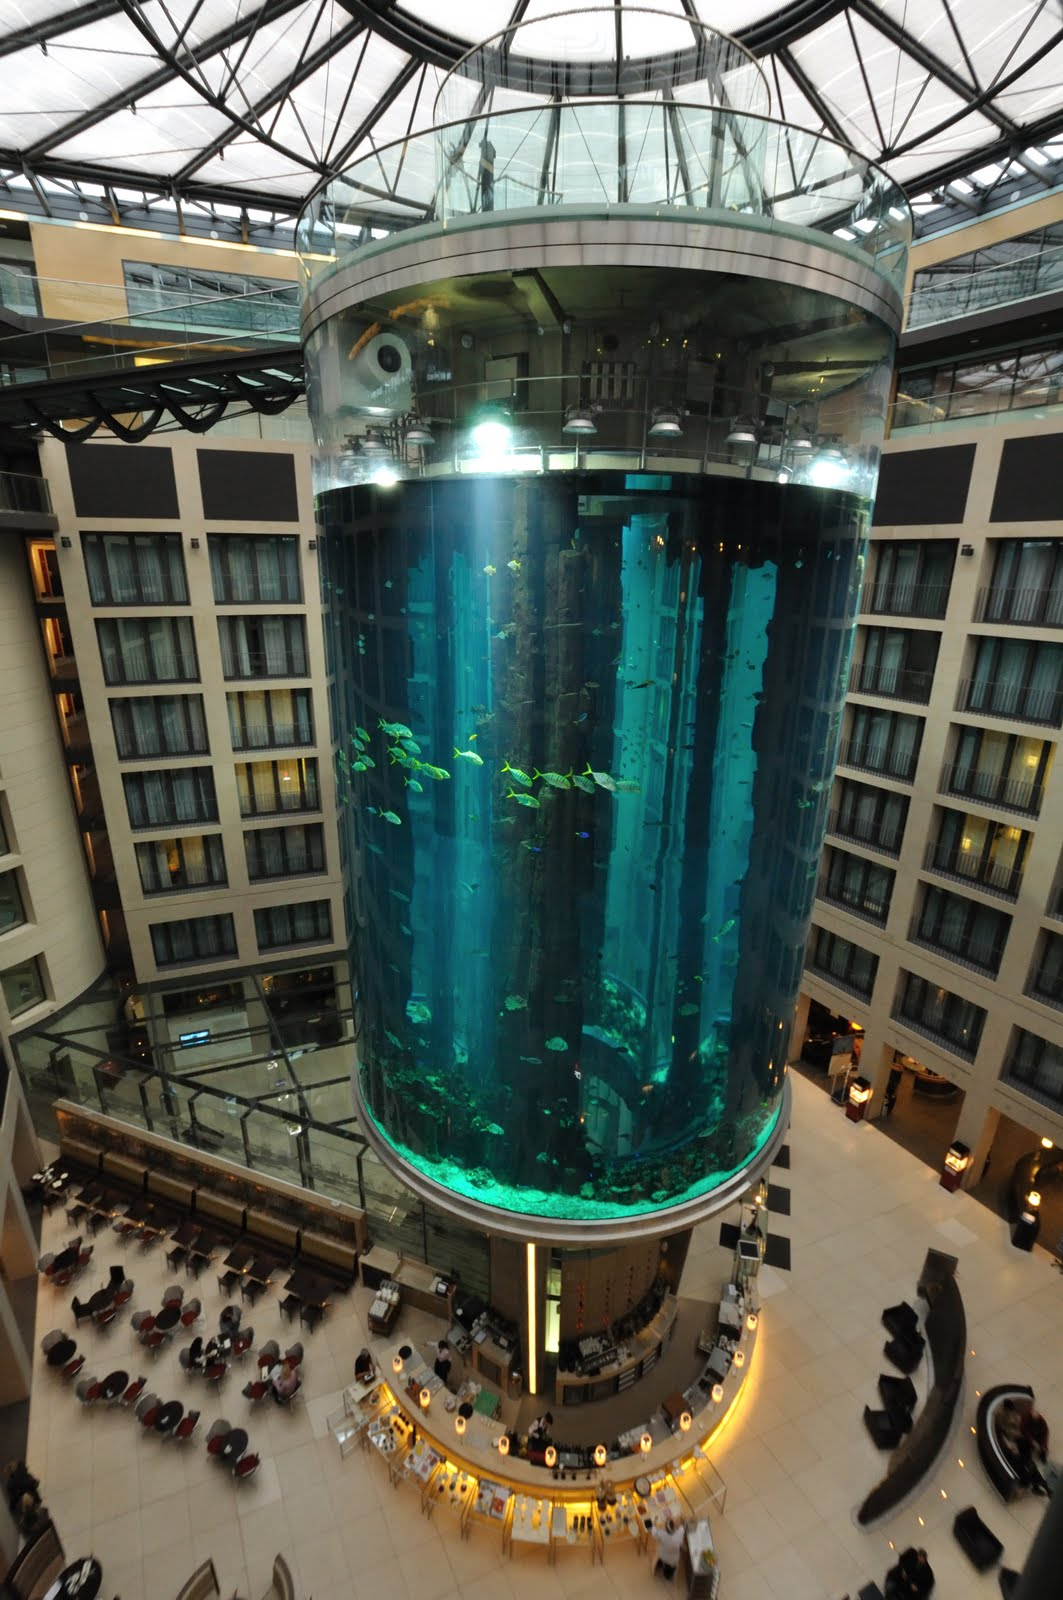 WORLD's LARGEST CYLINDRICAL AQUARIUM (AQUADOM)